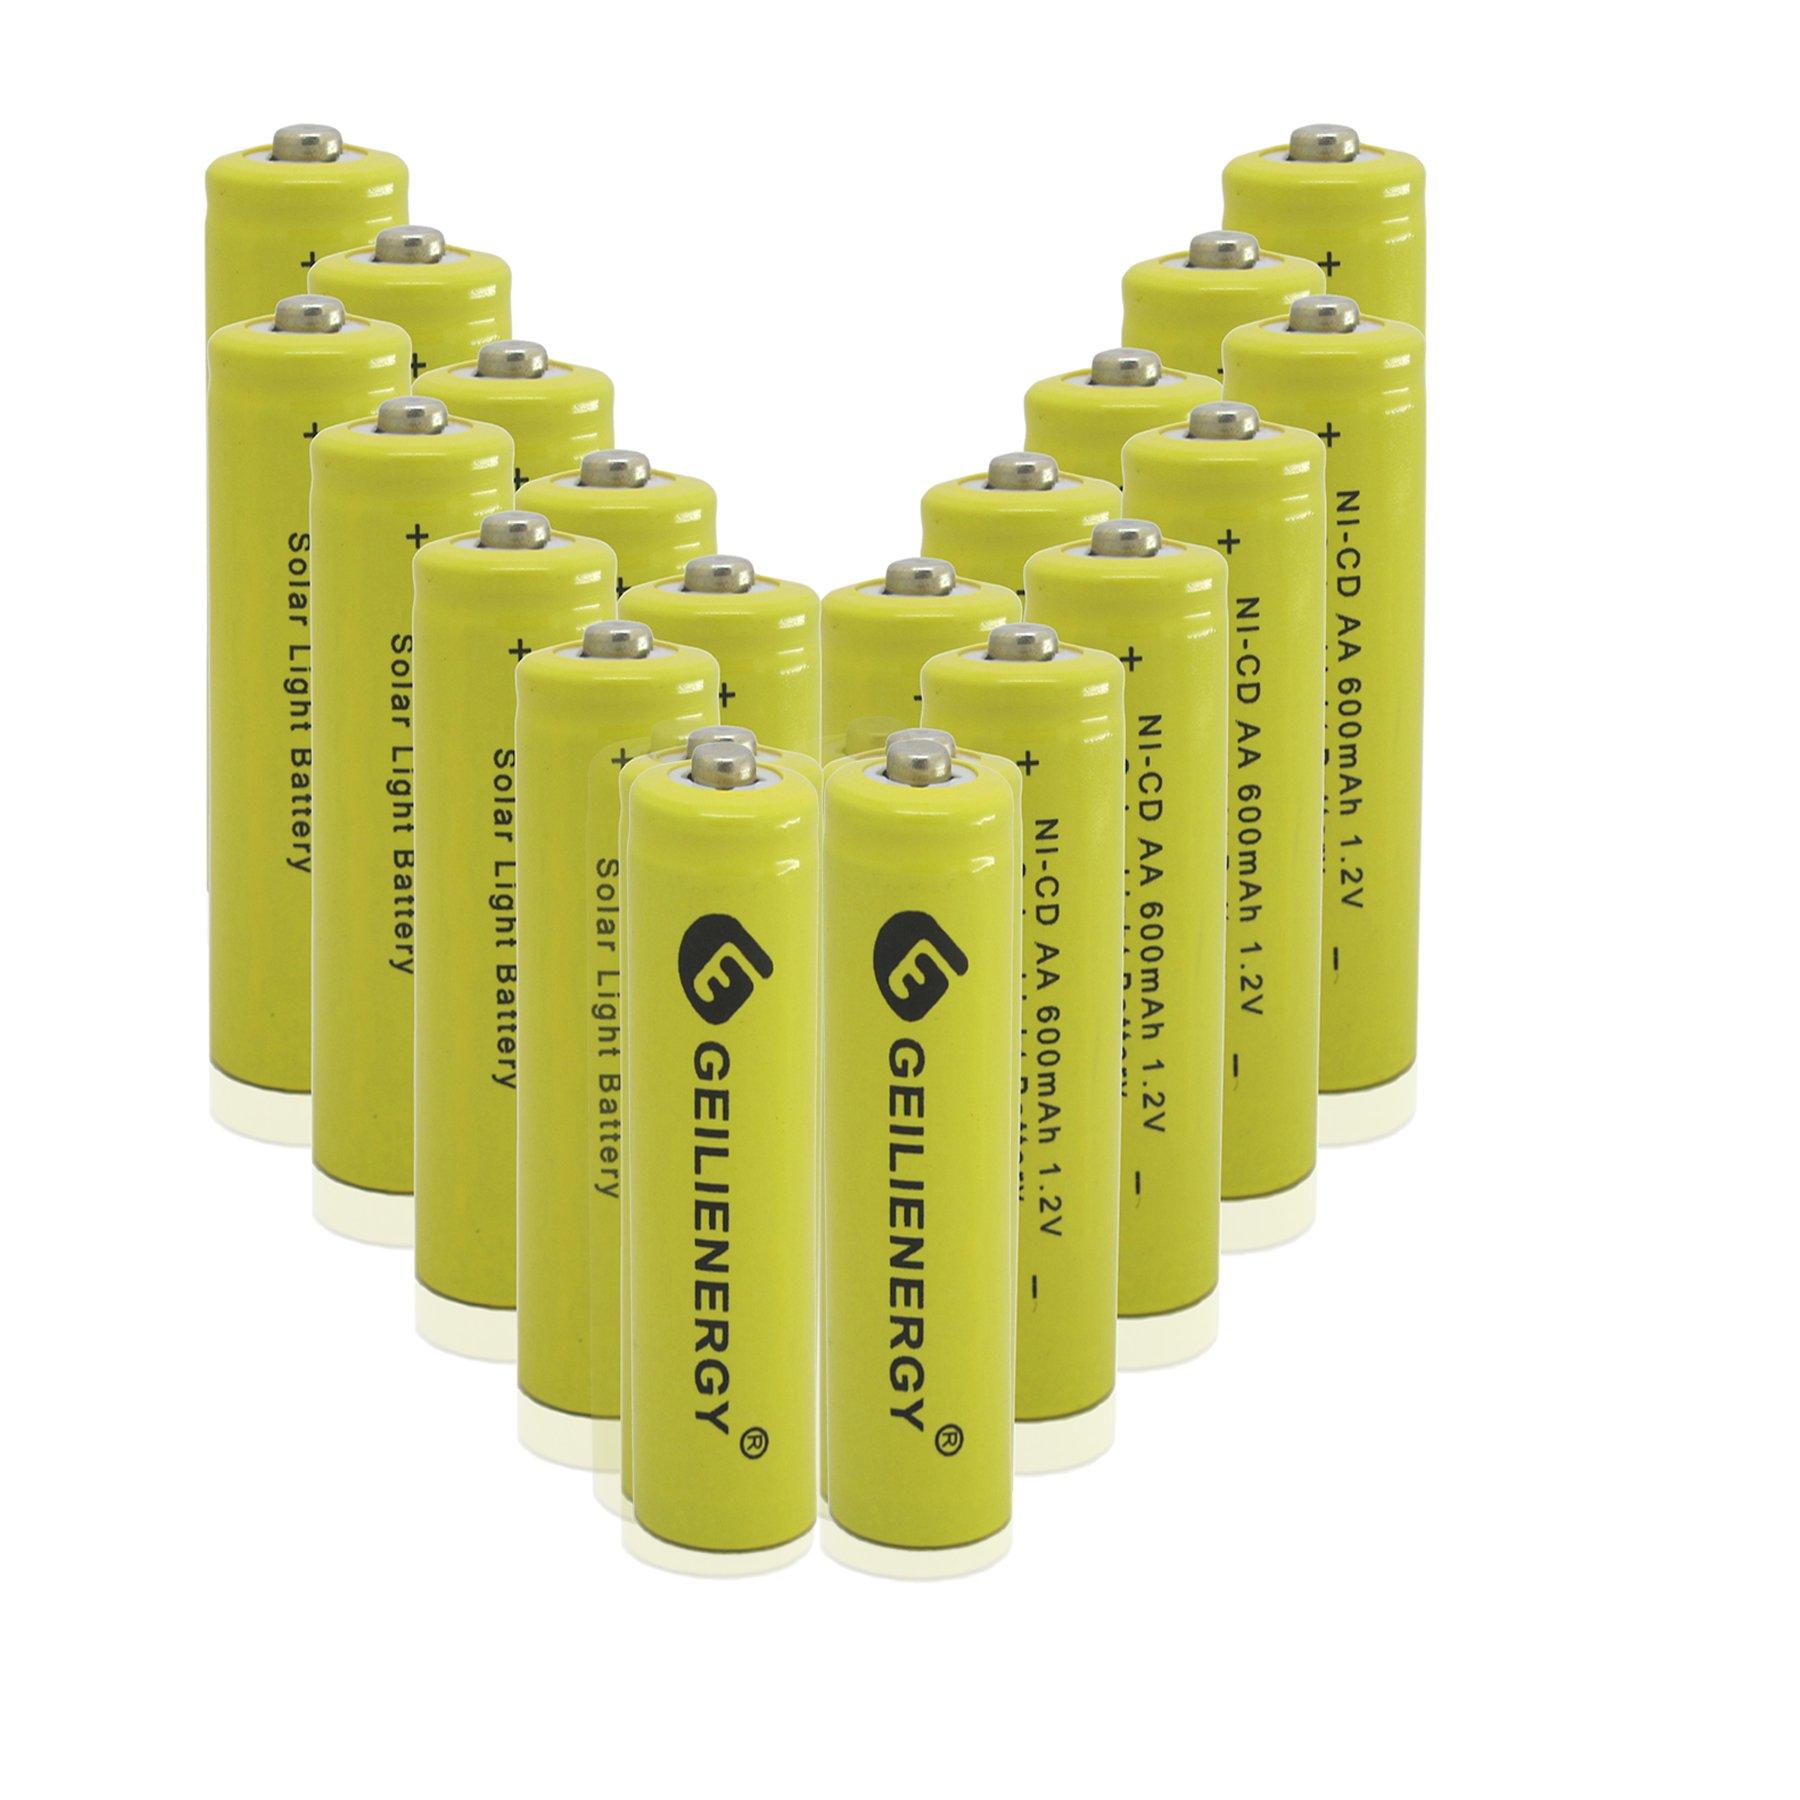 Rechargeable Batteries 600mAh Garden Lights